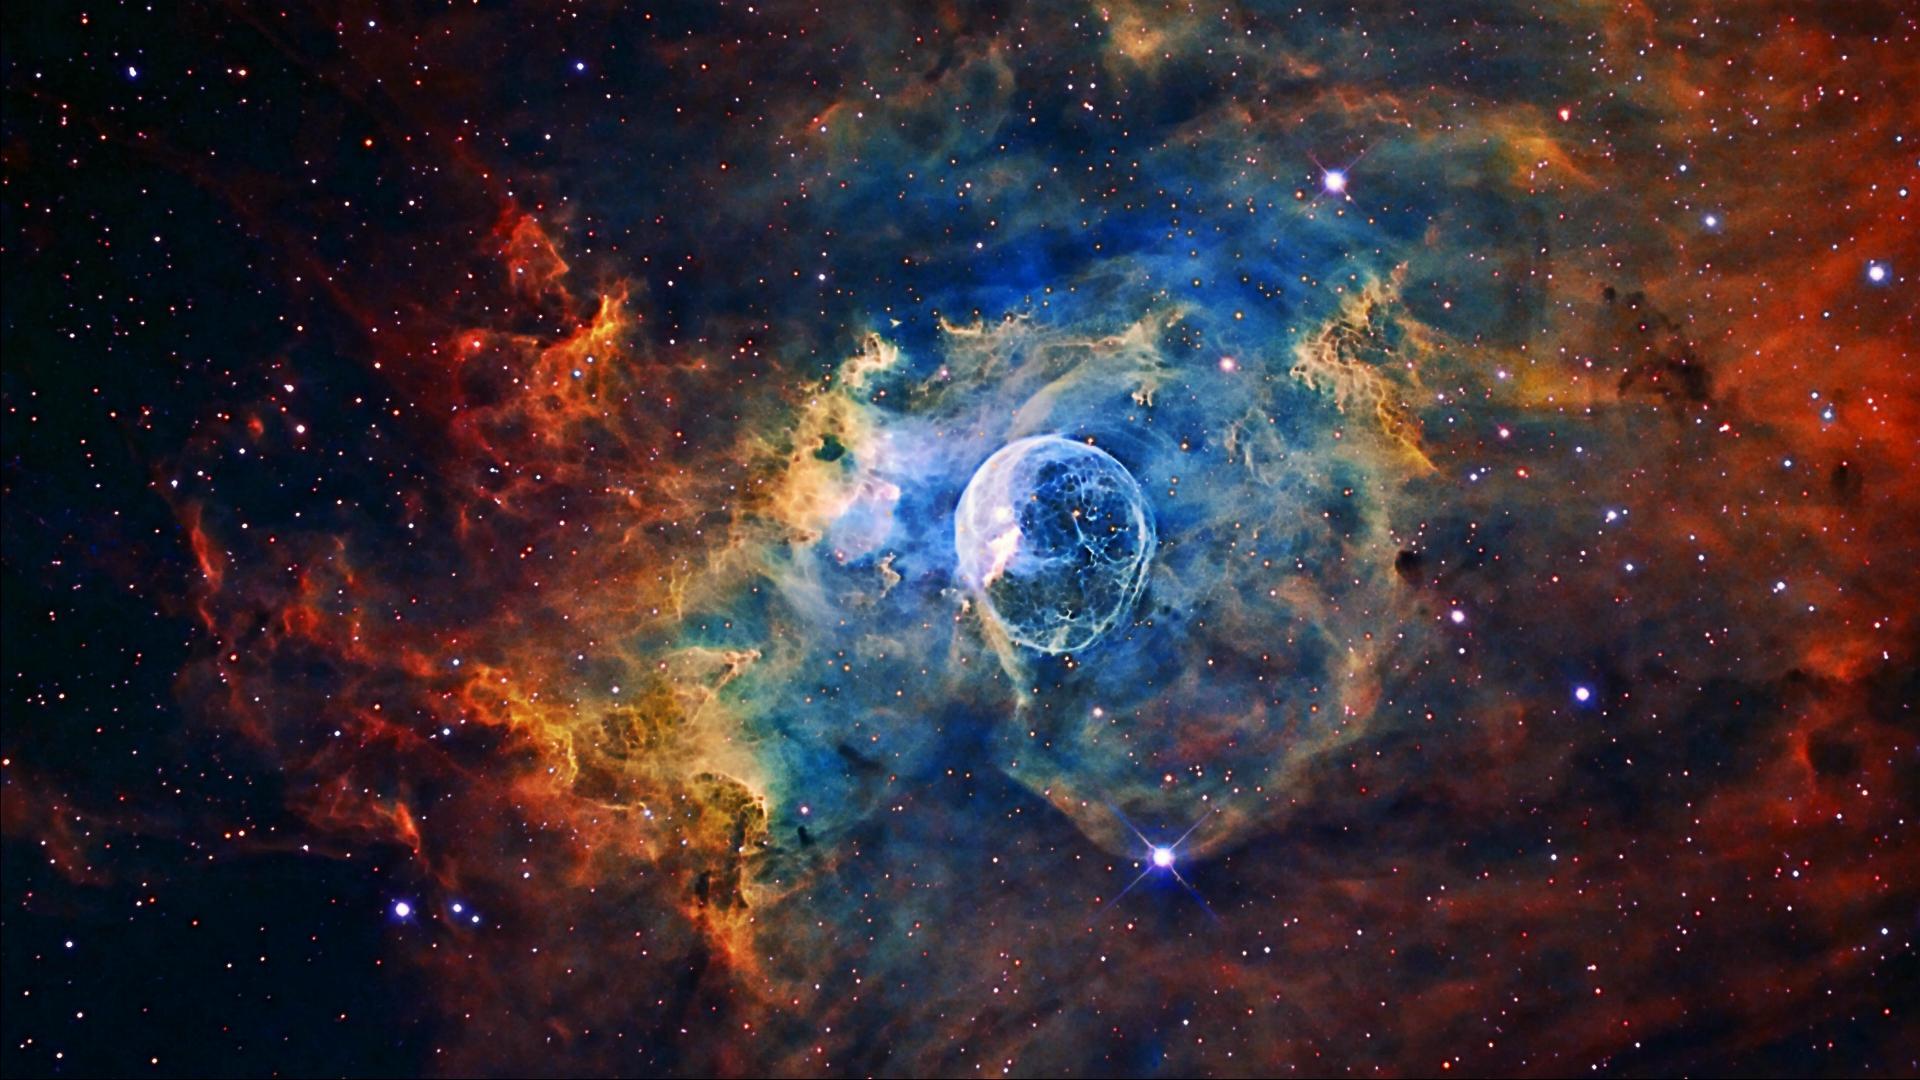 Car Chase Wallpaper Hd Stellar Bubble Nebula Image For Hubble S 26th Anniversary